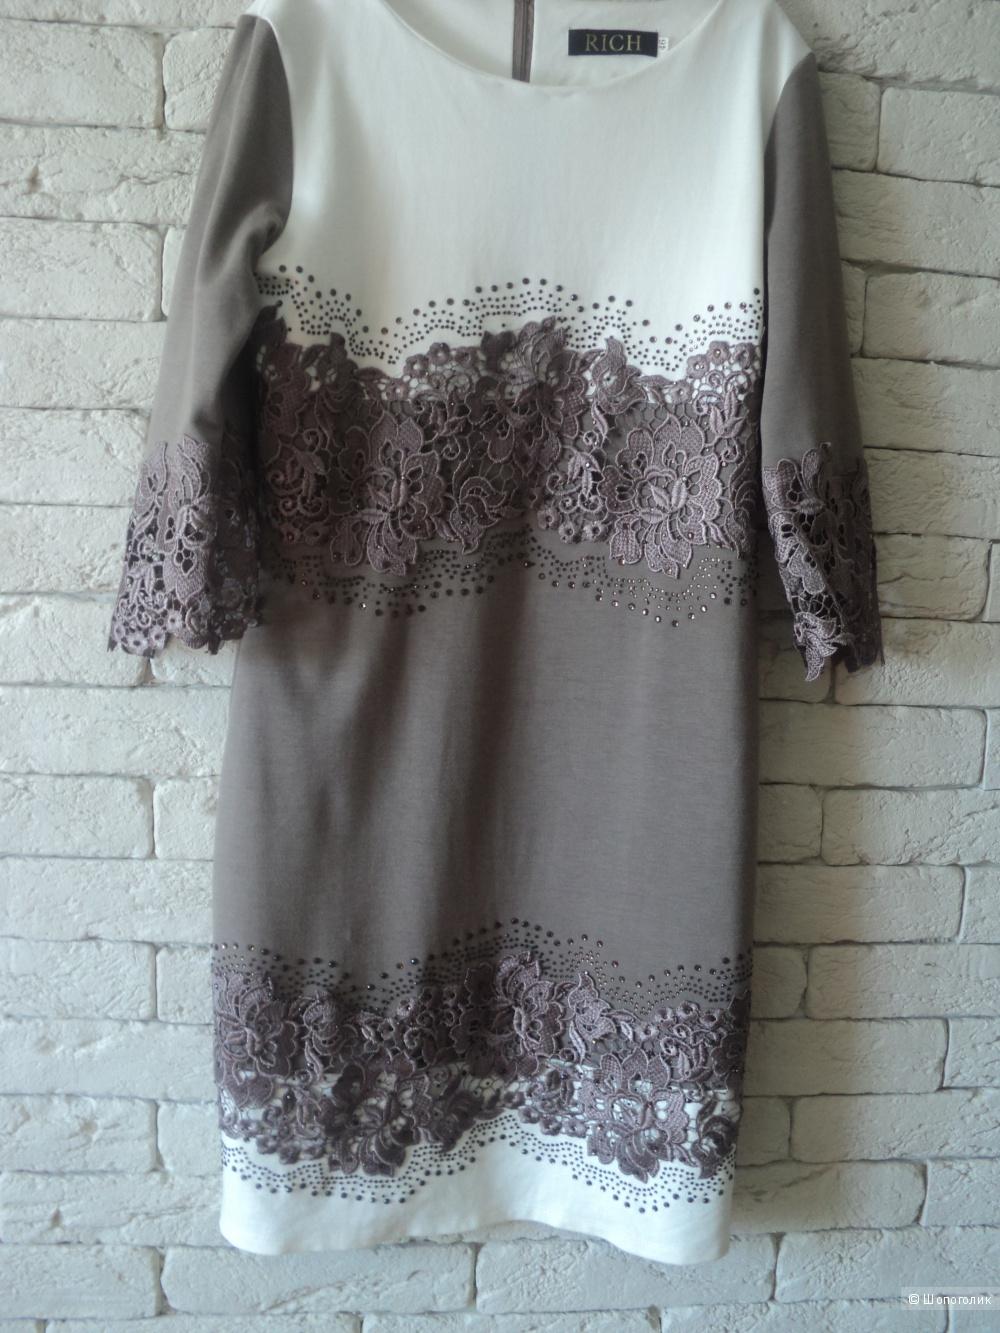 Платье RICH, трикотаж,гипюр, размер 46, б/у